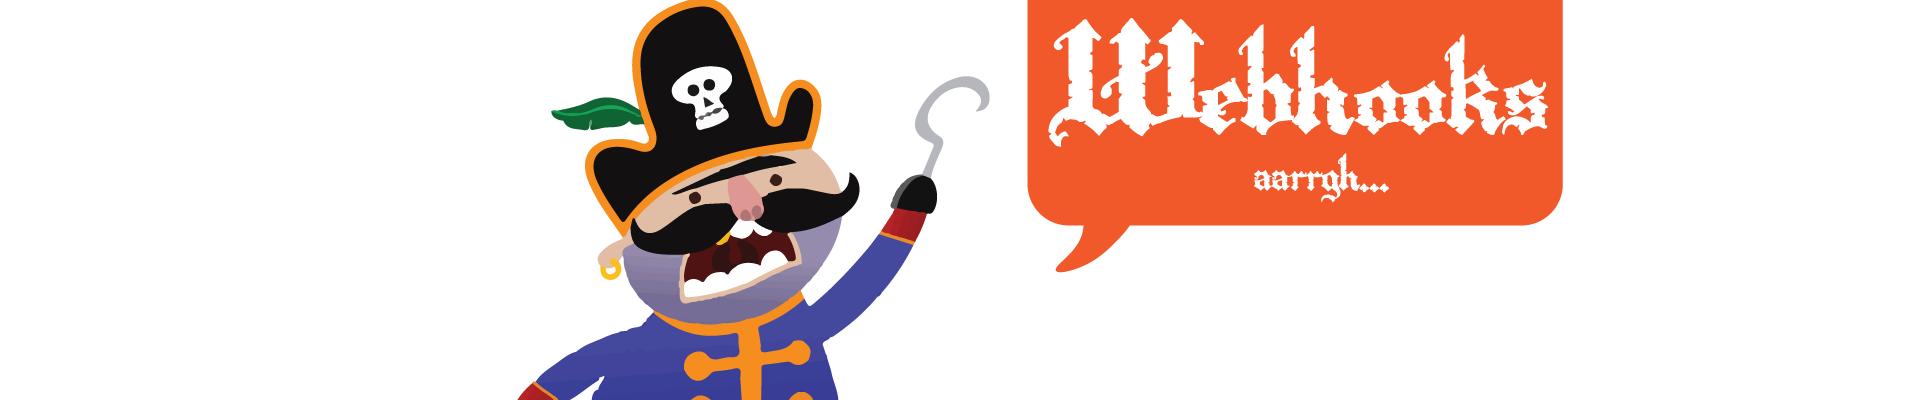 pirate-webhook-clipart